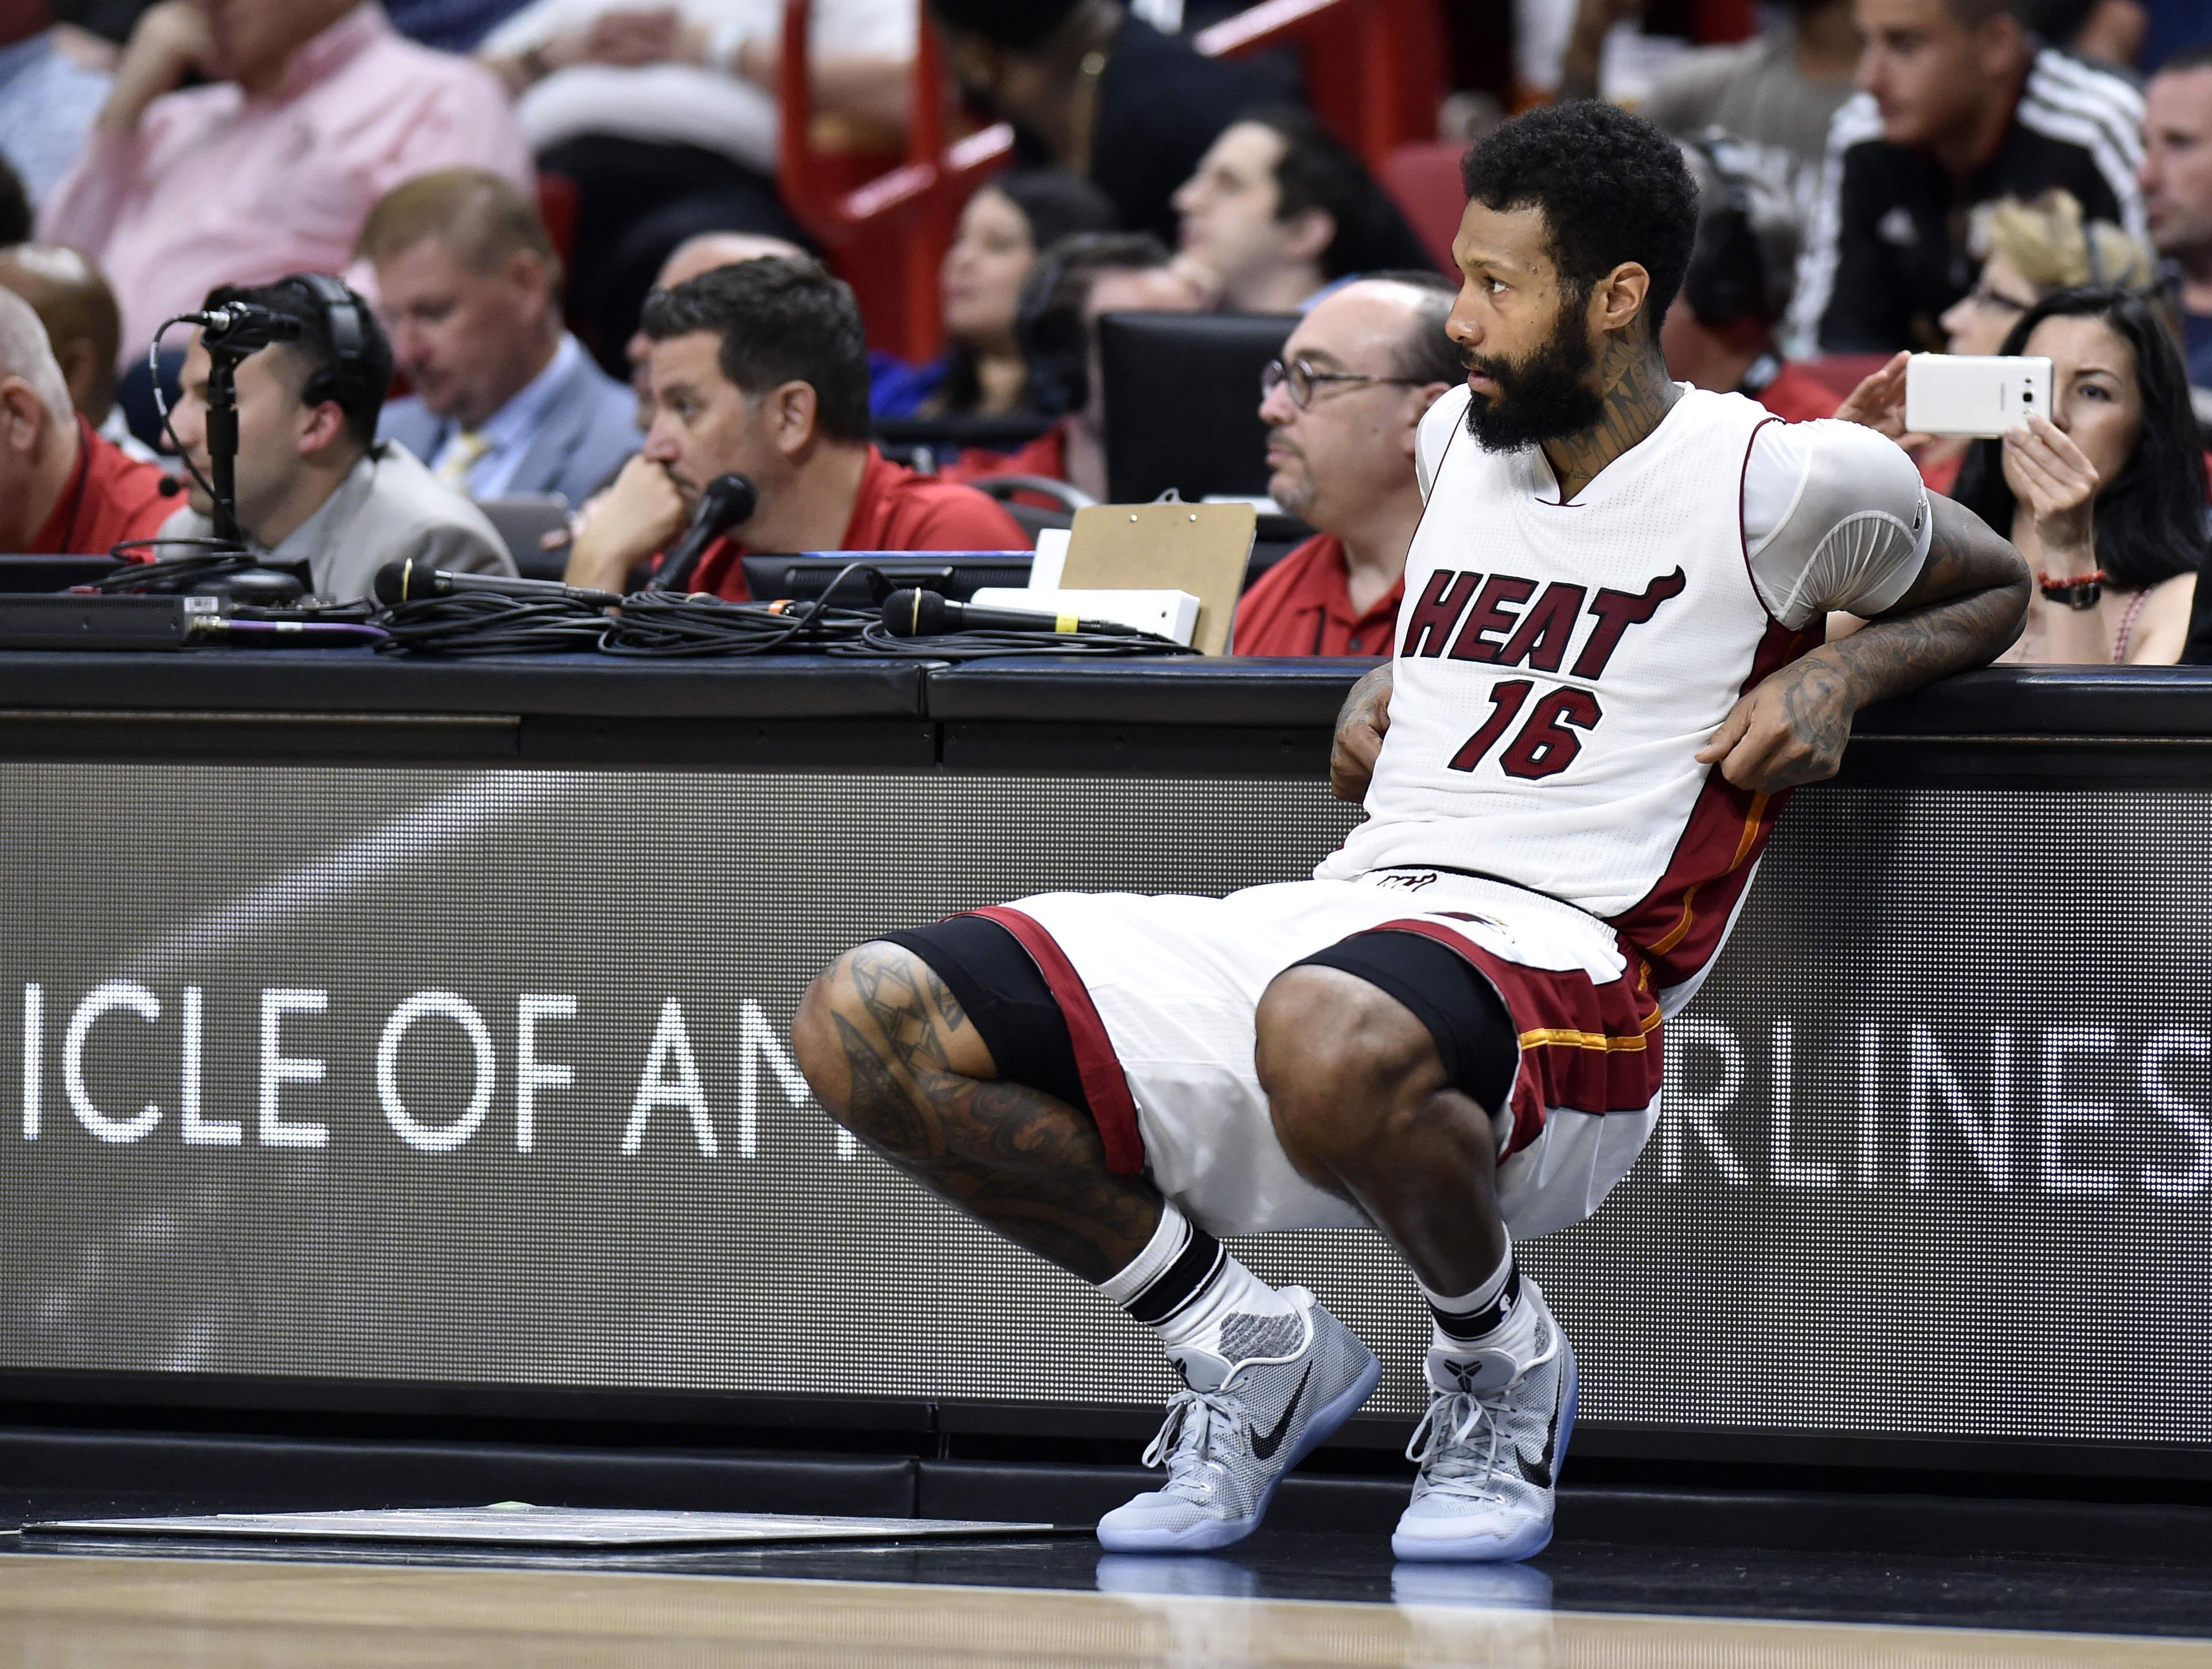 Miami heat roster nba - Download Miami Heat Roster 2015 Nba